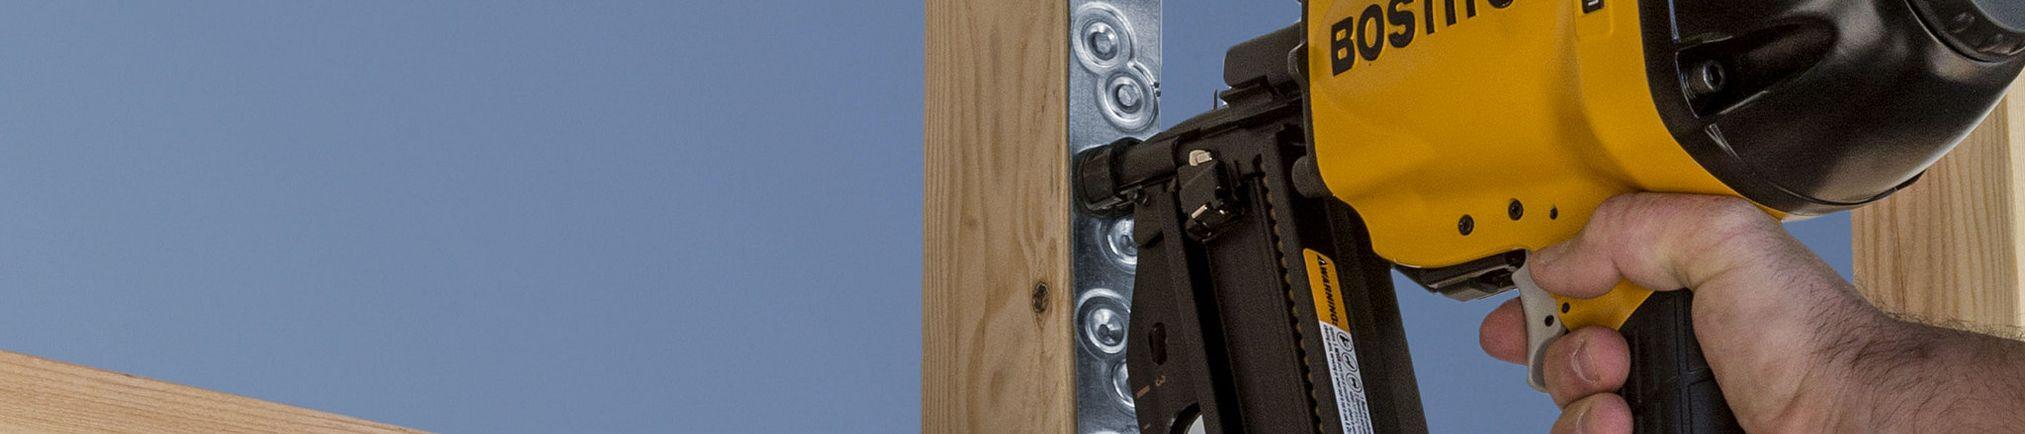 CSHP High-Performance Coiled Strap